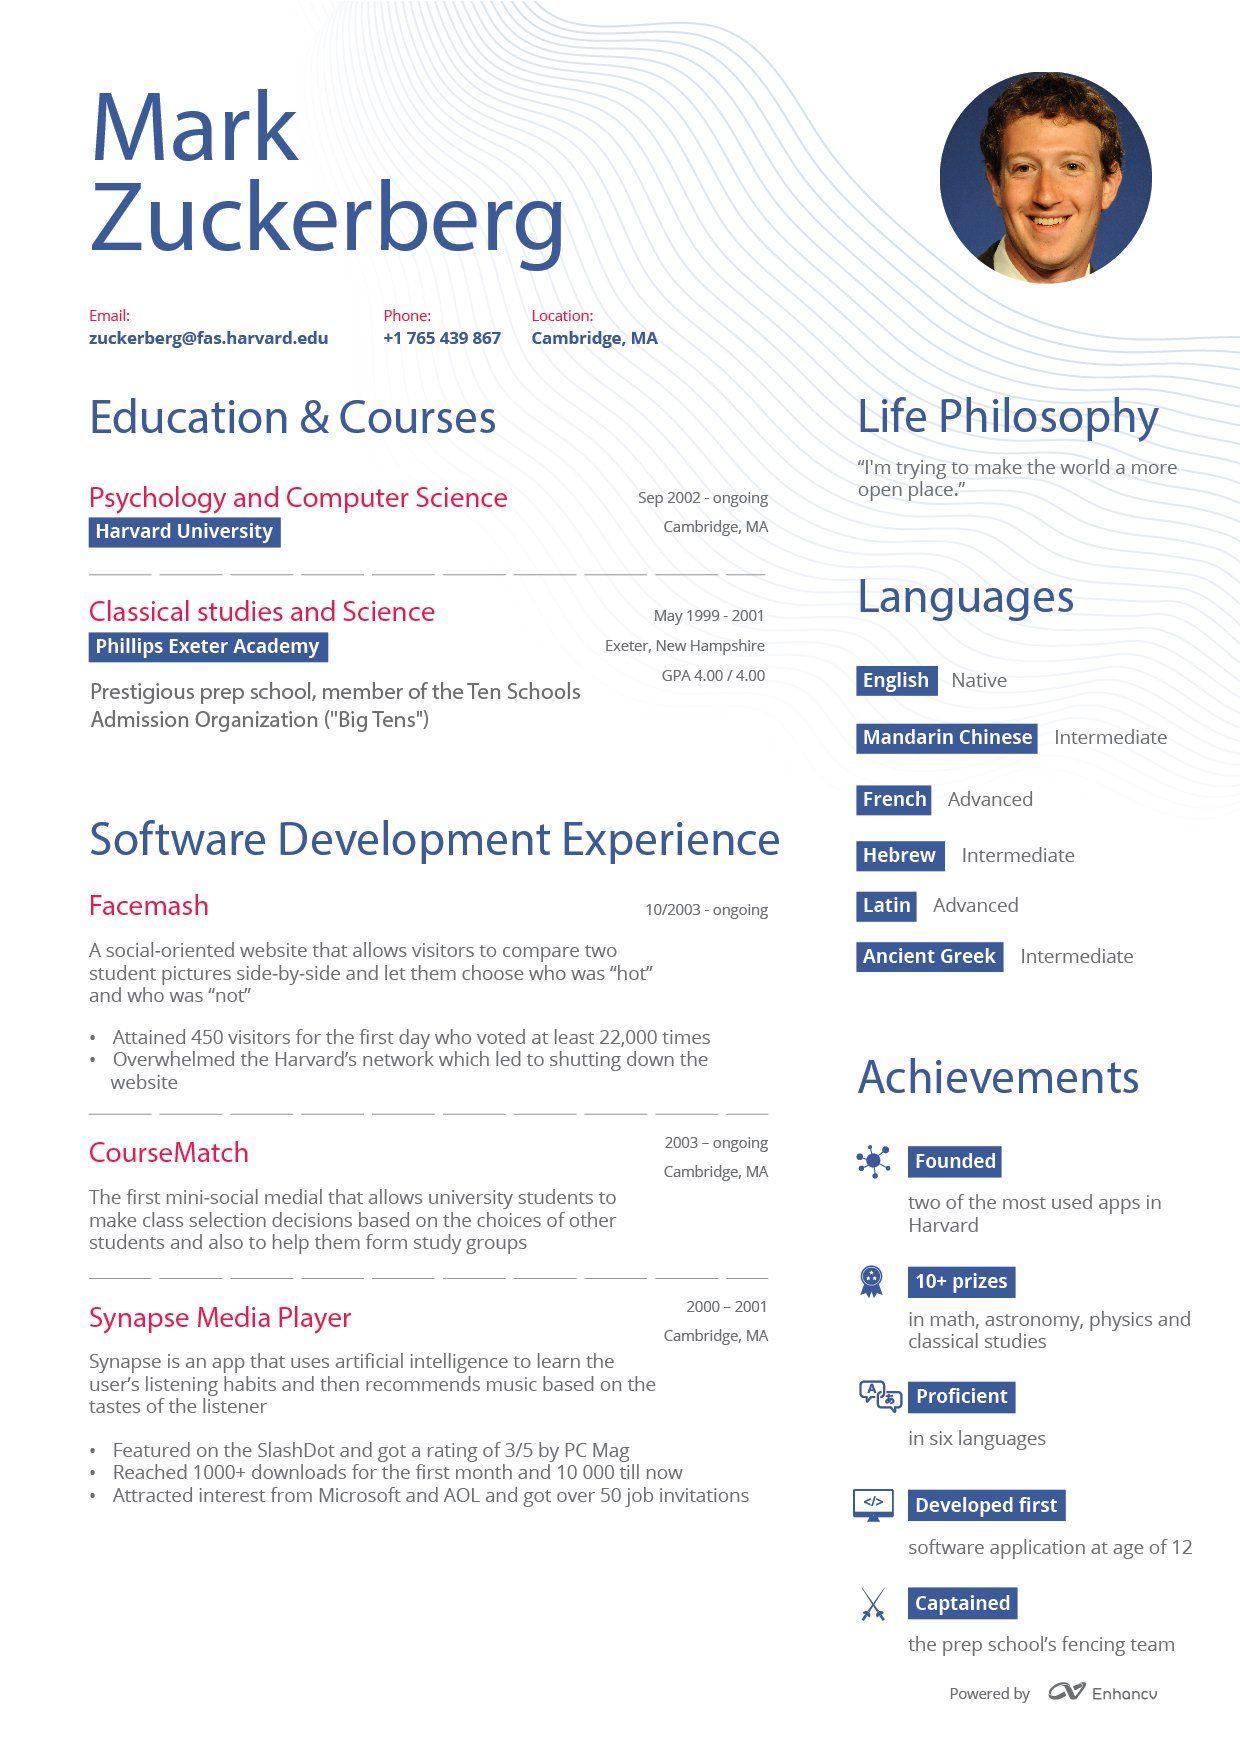 What Mark Zuckerberg's resume might look like if he never